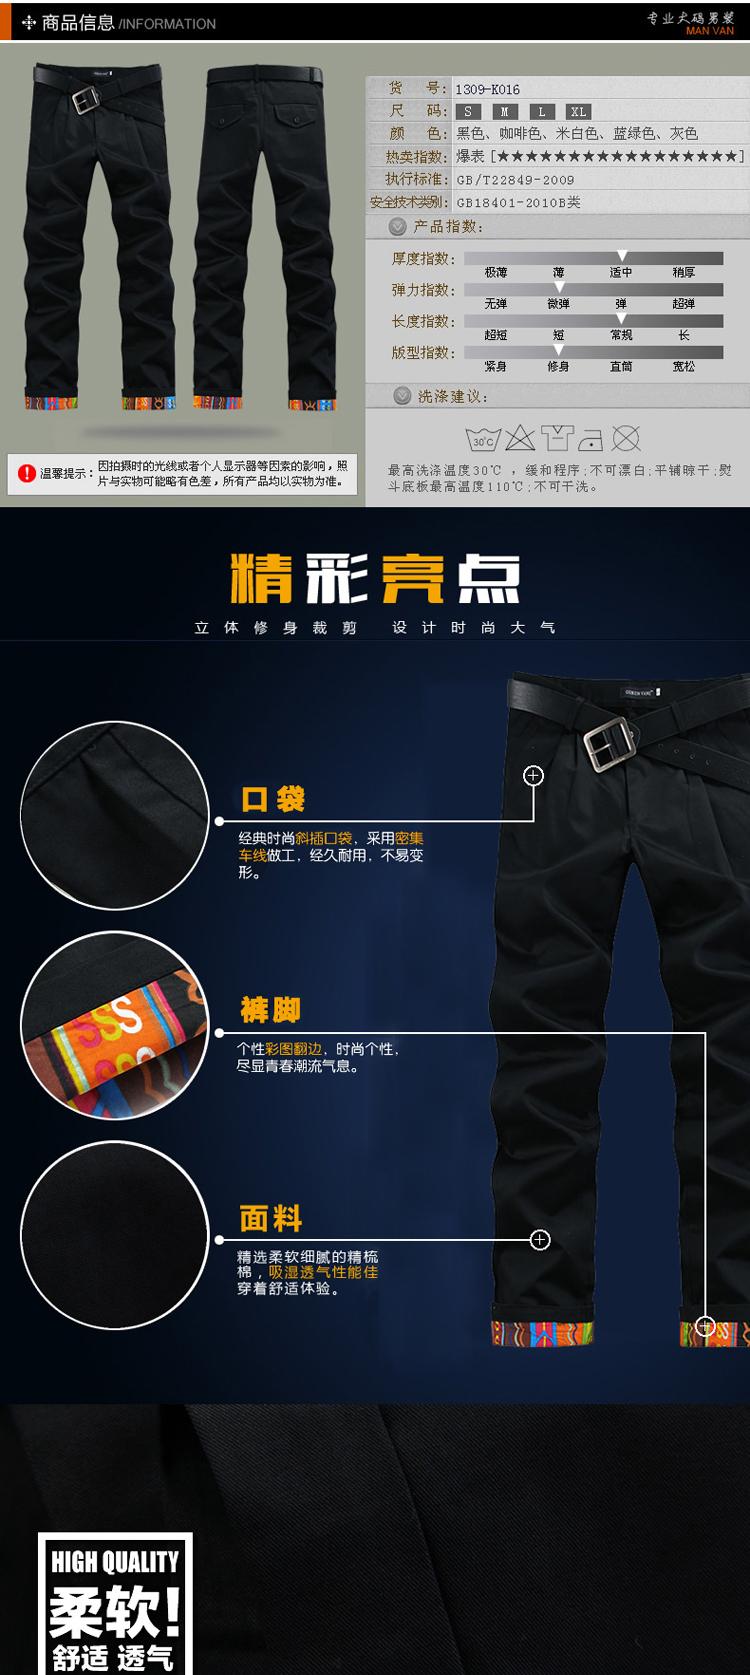 aieco 2014新款 英伦裤口贴布修身小脚直筒男士休闲裤